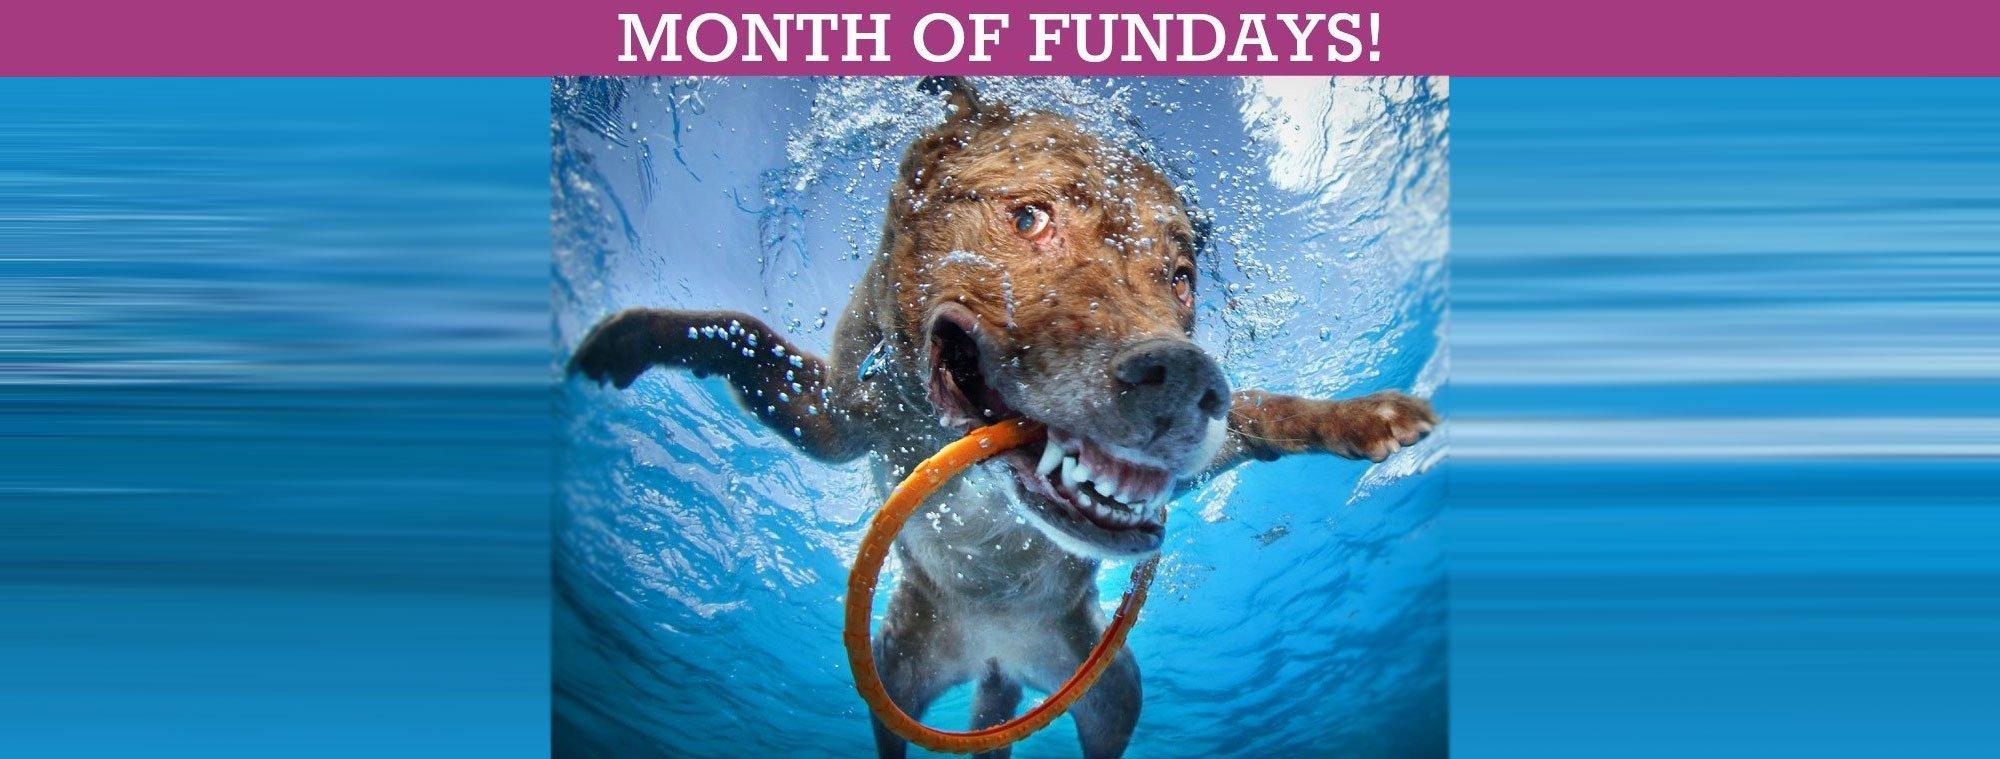 MONTH OF FUNDAYS! Sept. 2021: Skipjacks, Festivals, Music, Stories & More